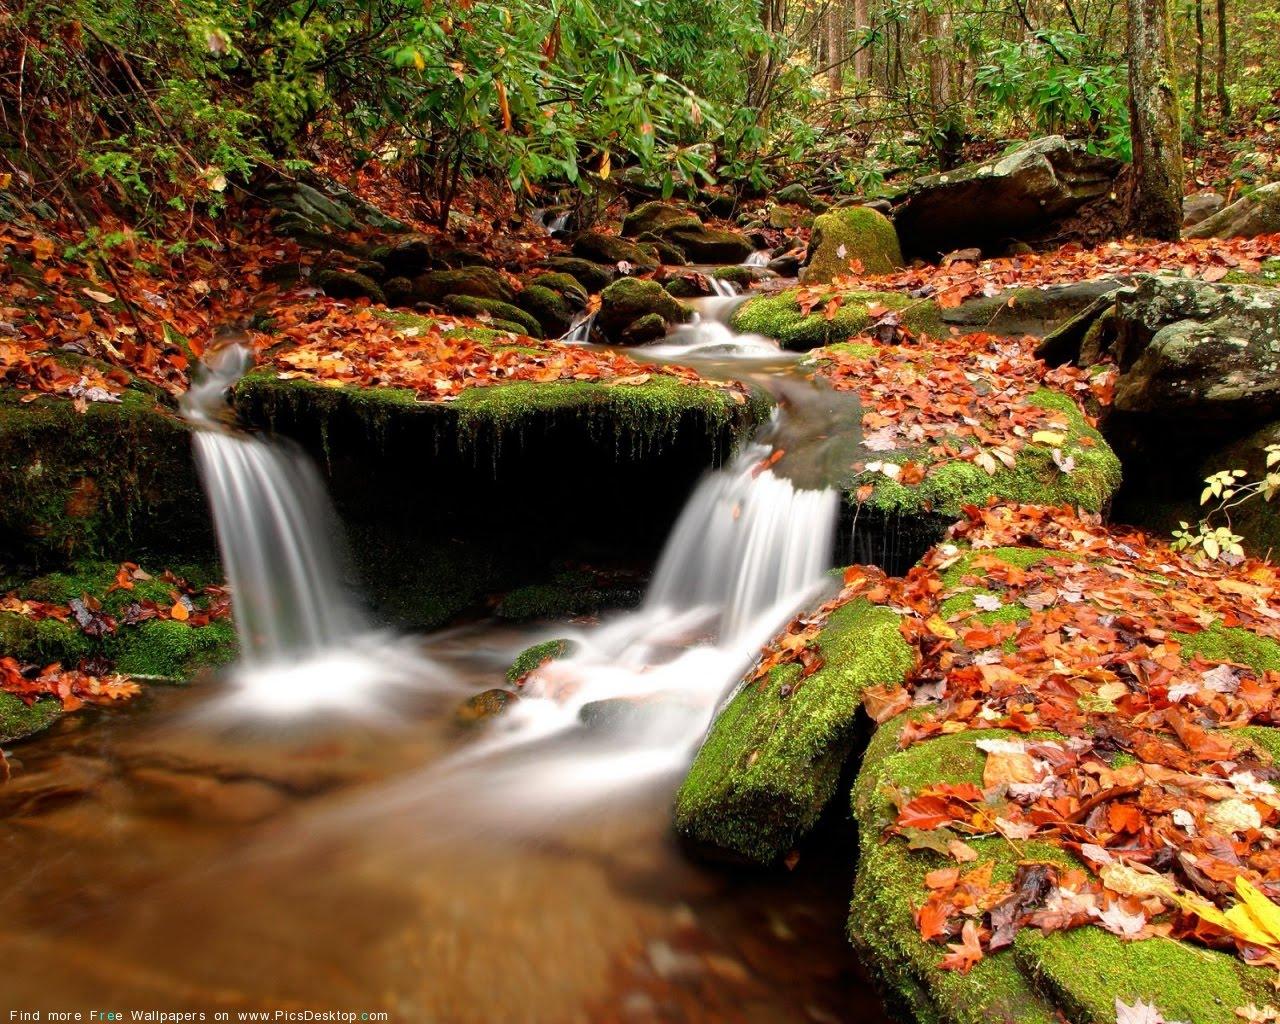 Waterfalls Wallpapers Most Beautiful Waterfall Wallpapers Waterfalls 1280x1024